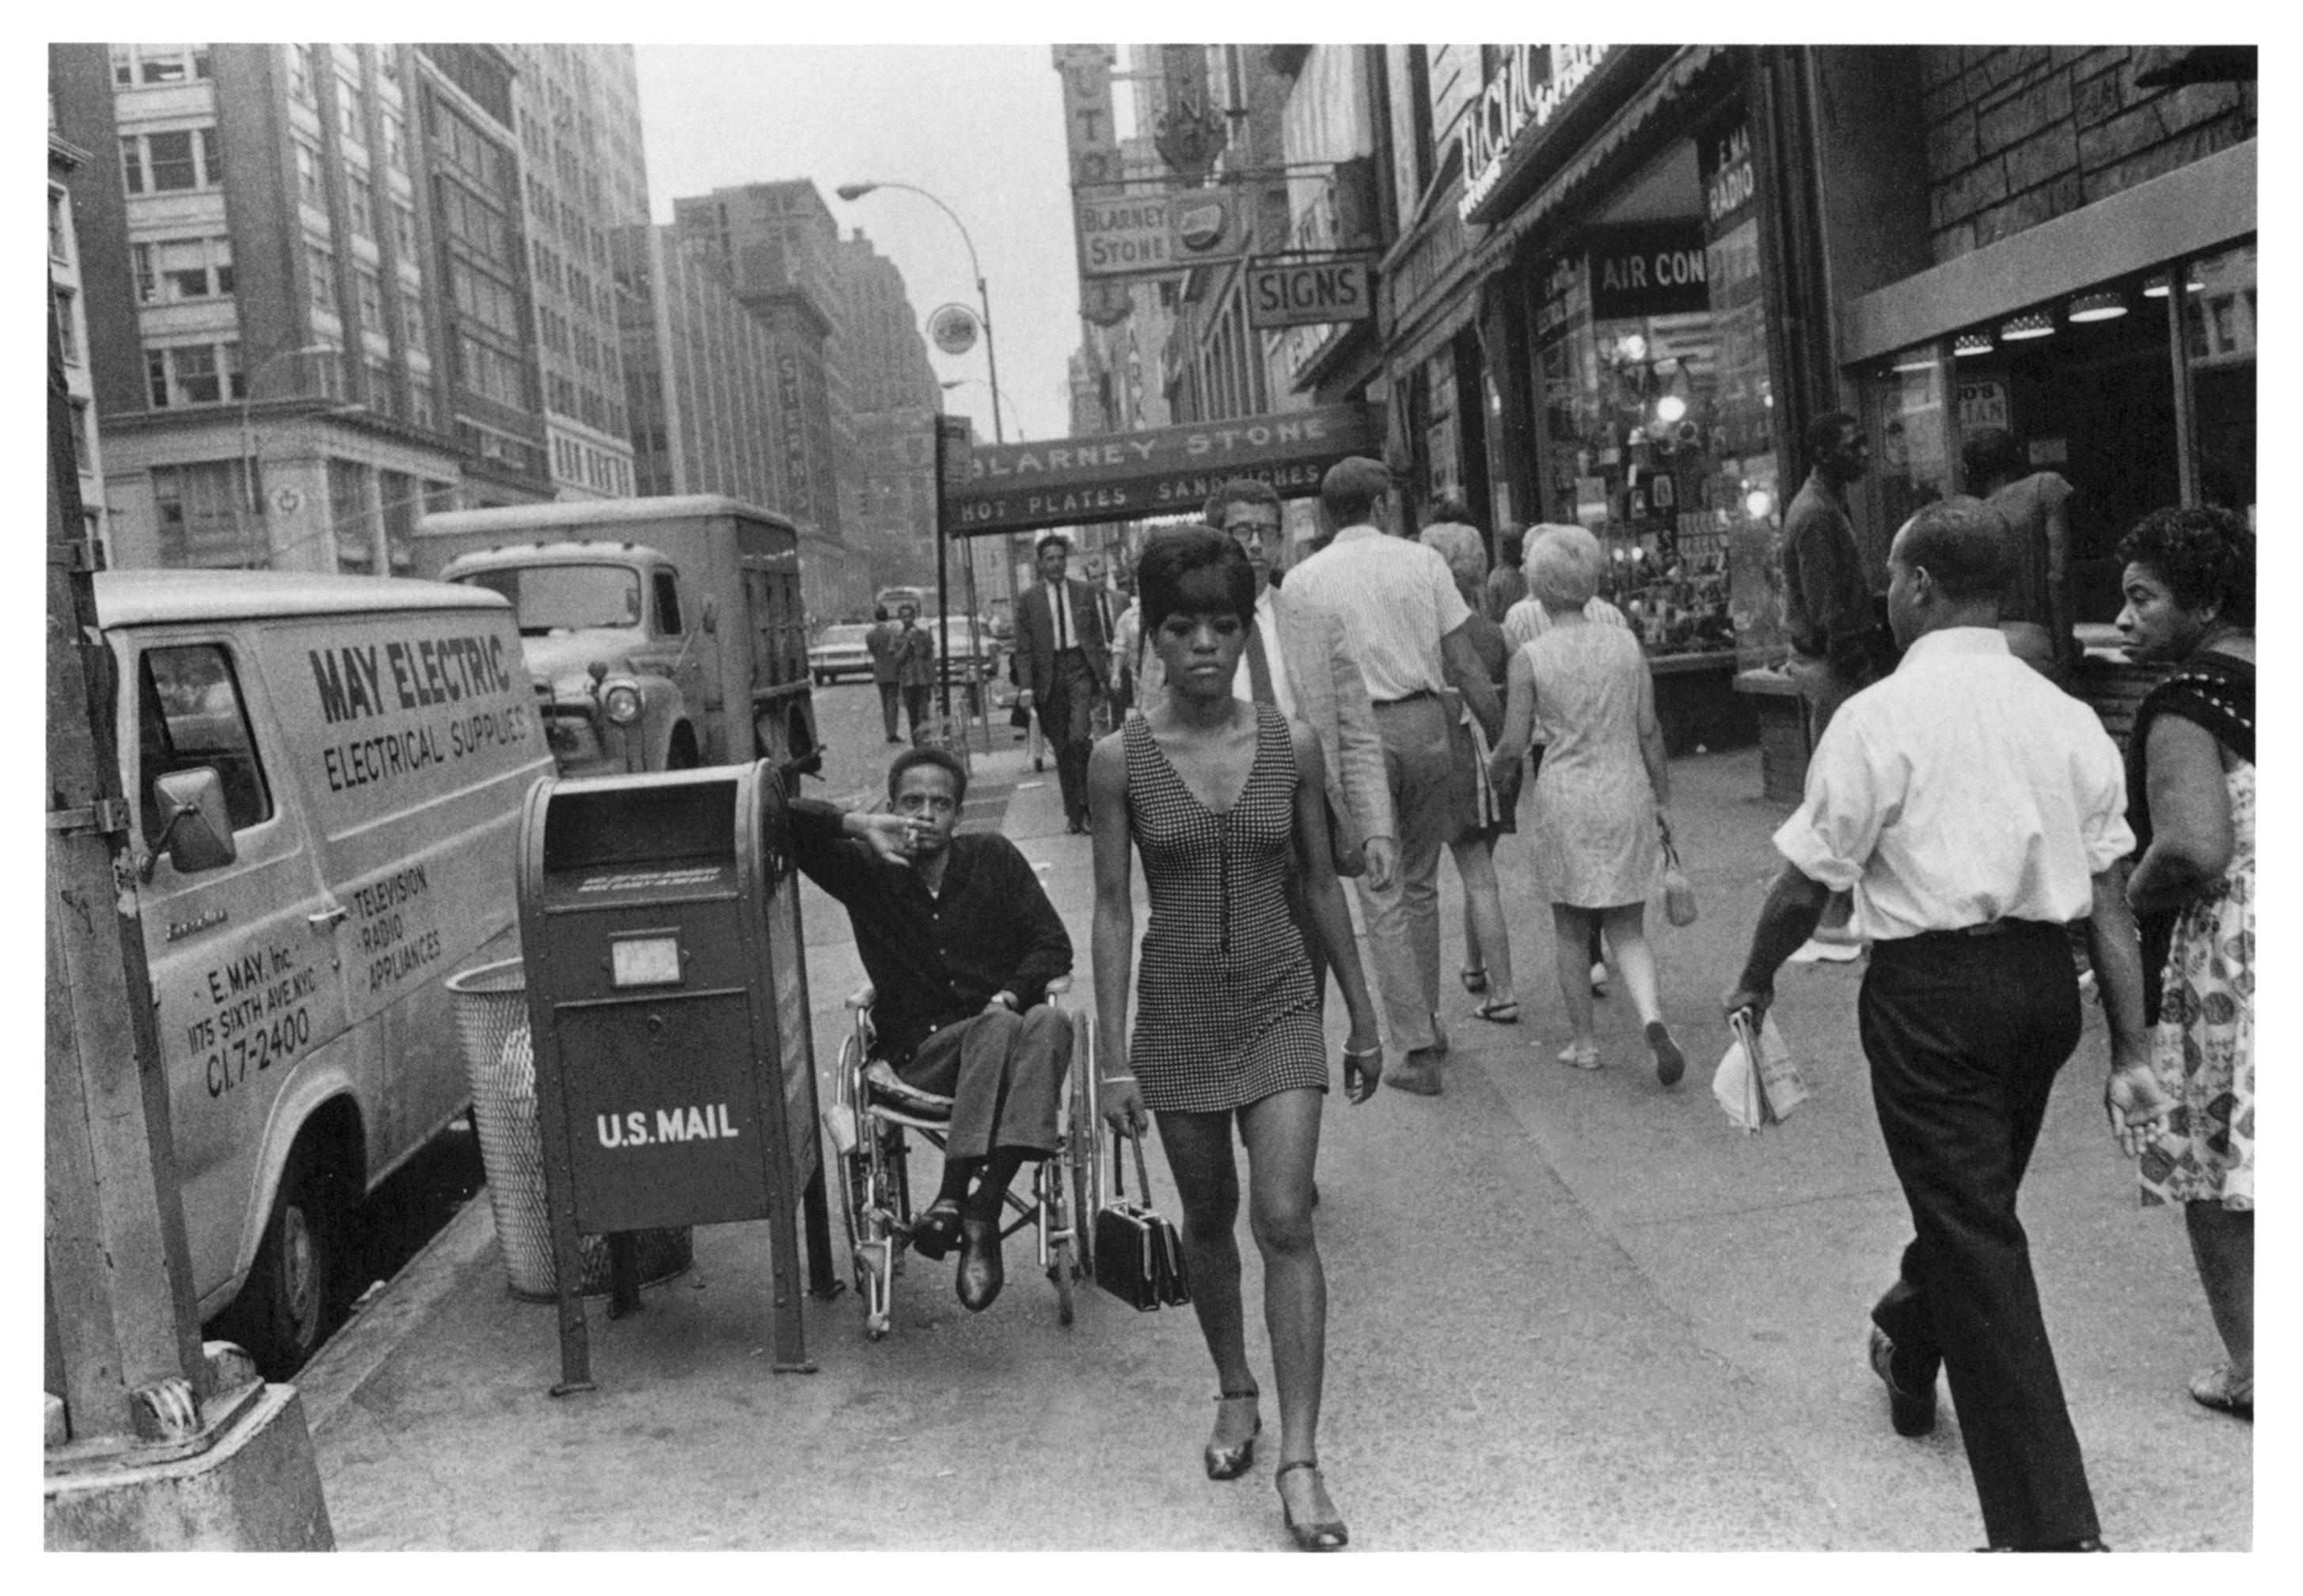 Joel Meyerowitz, New York, 1971. Courtesy of Joel Meyerowitz